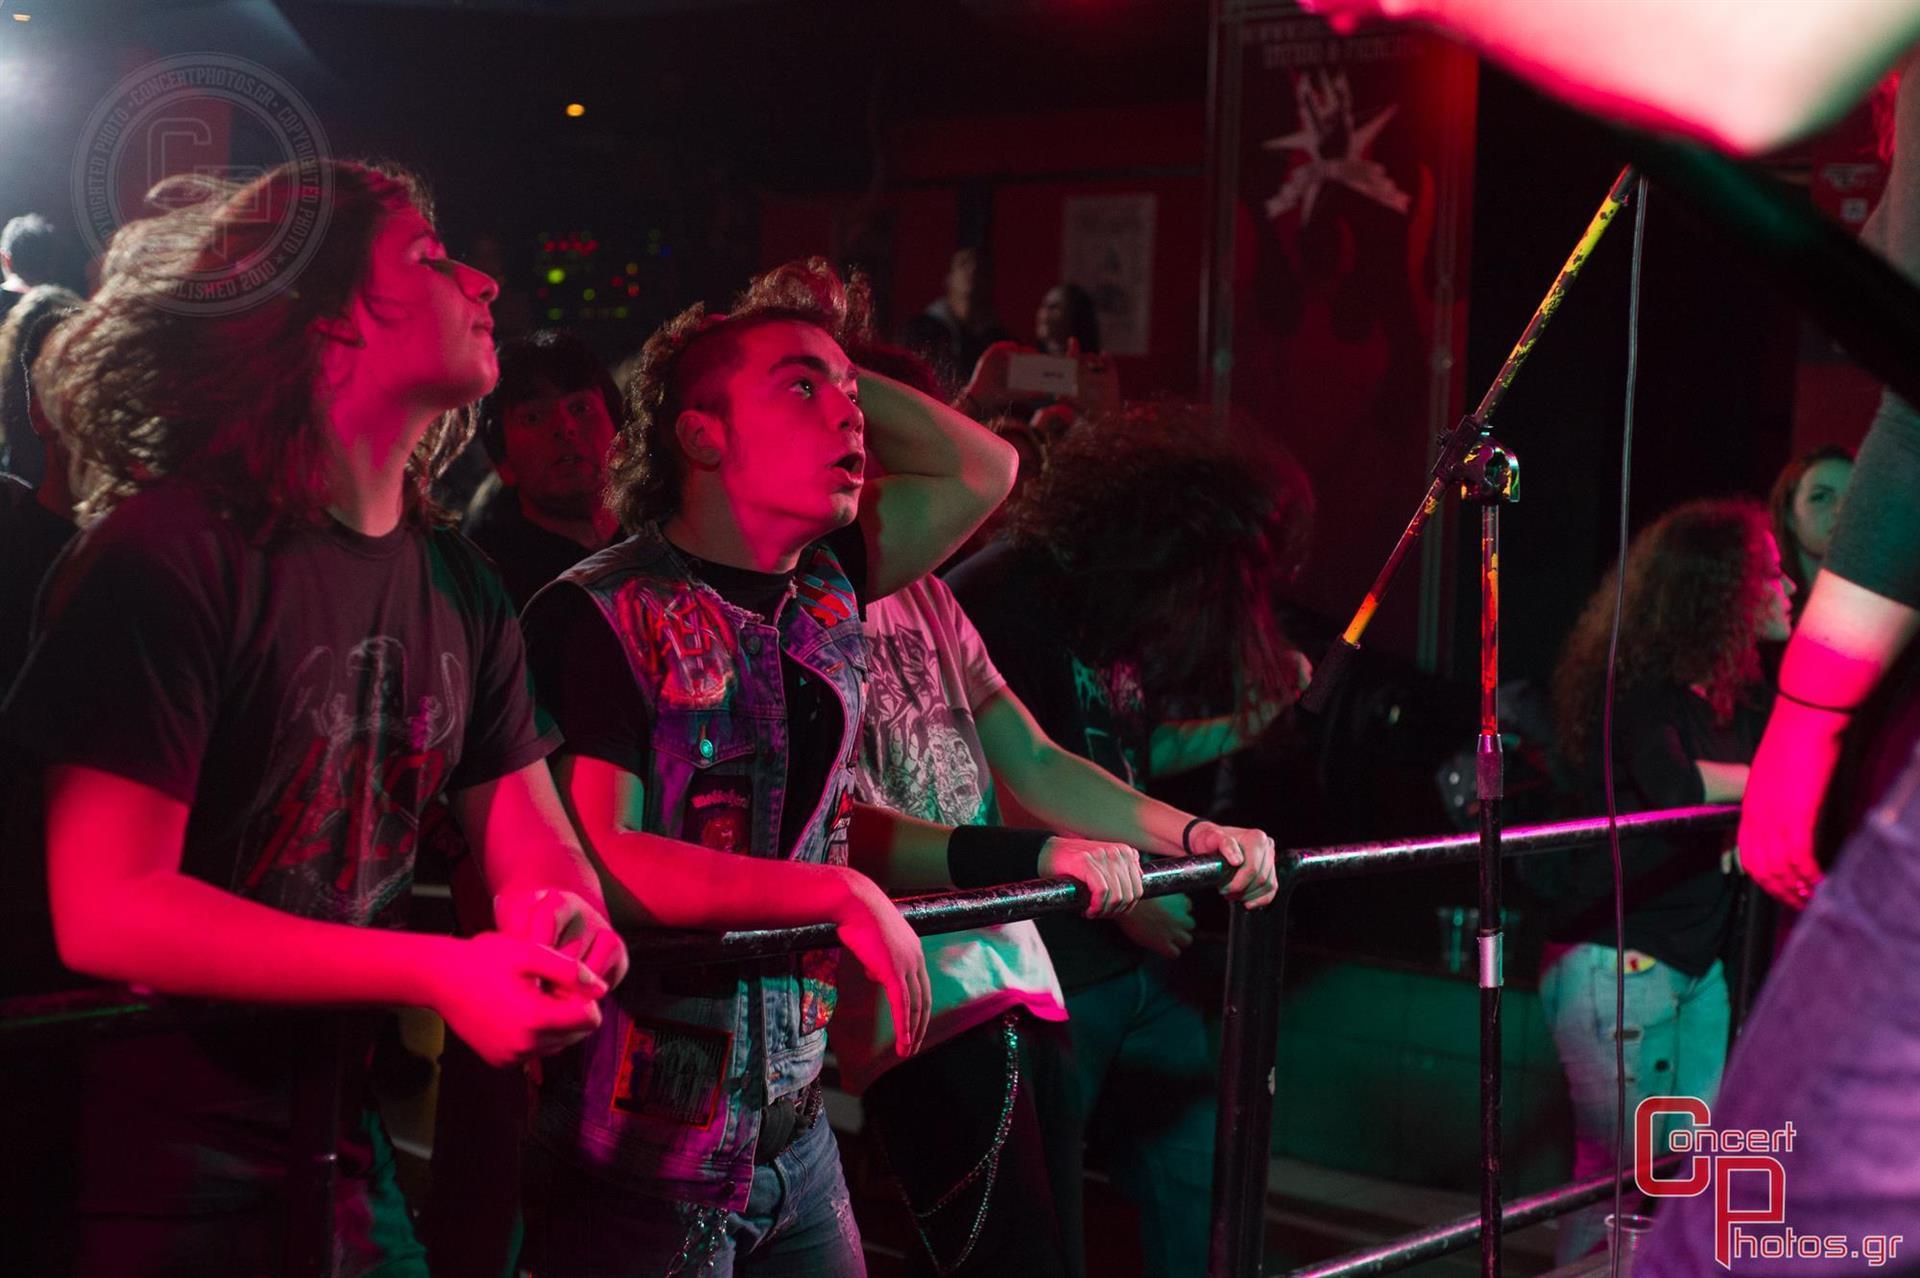 Battle Of The Bands Athens - Leg 3- photographer:  - ConcertPhotos - 20150104_2155_30